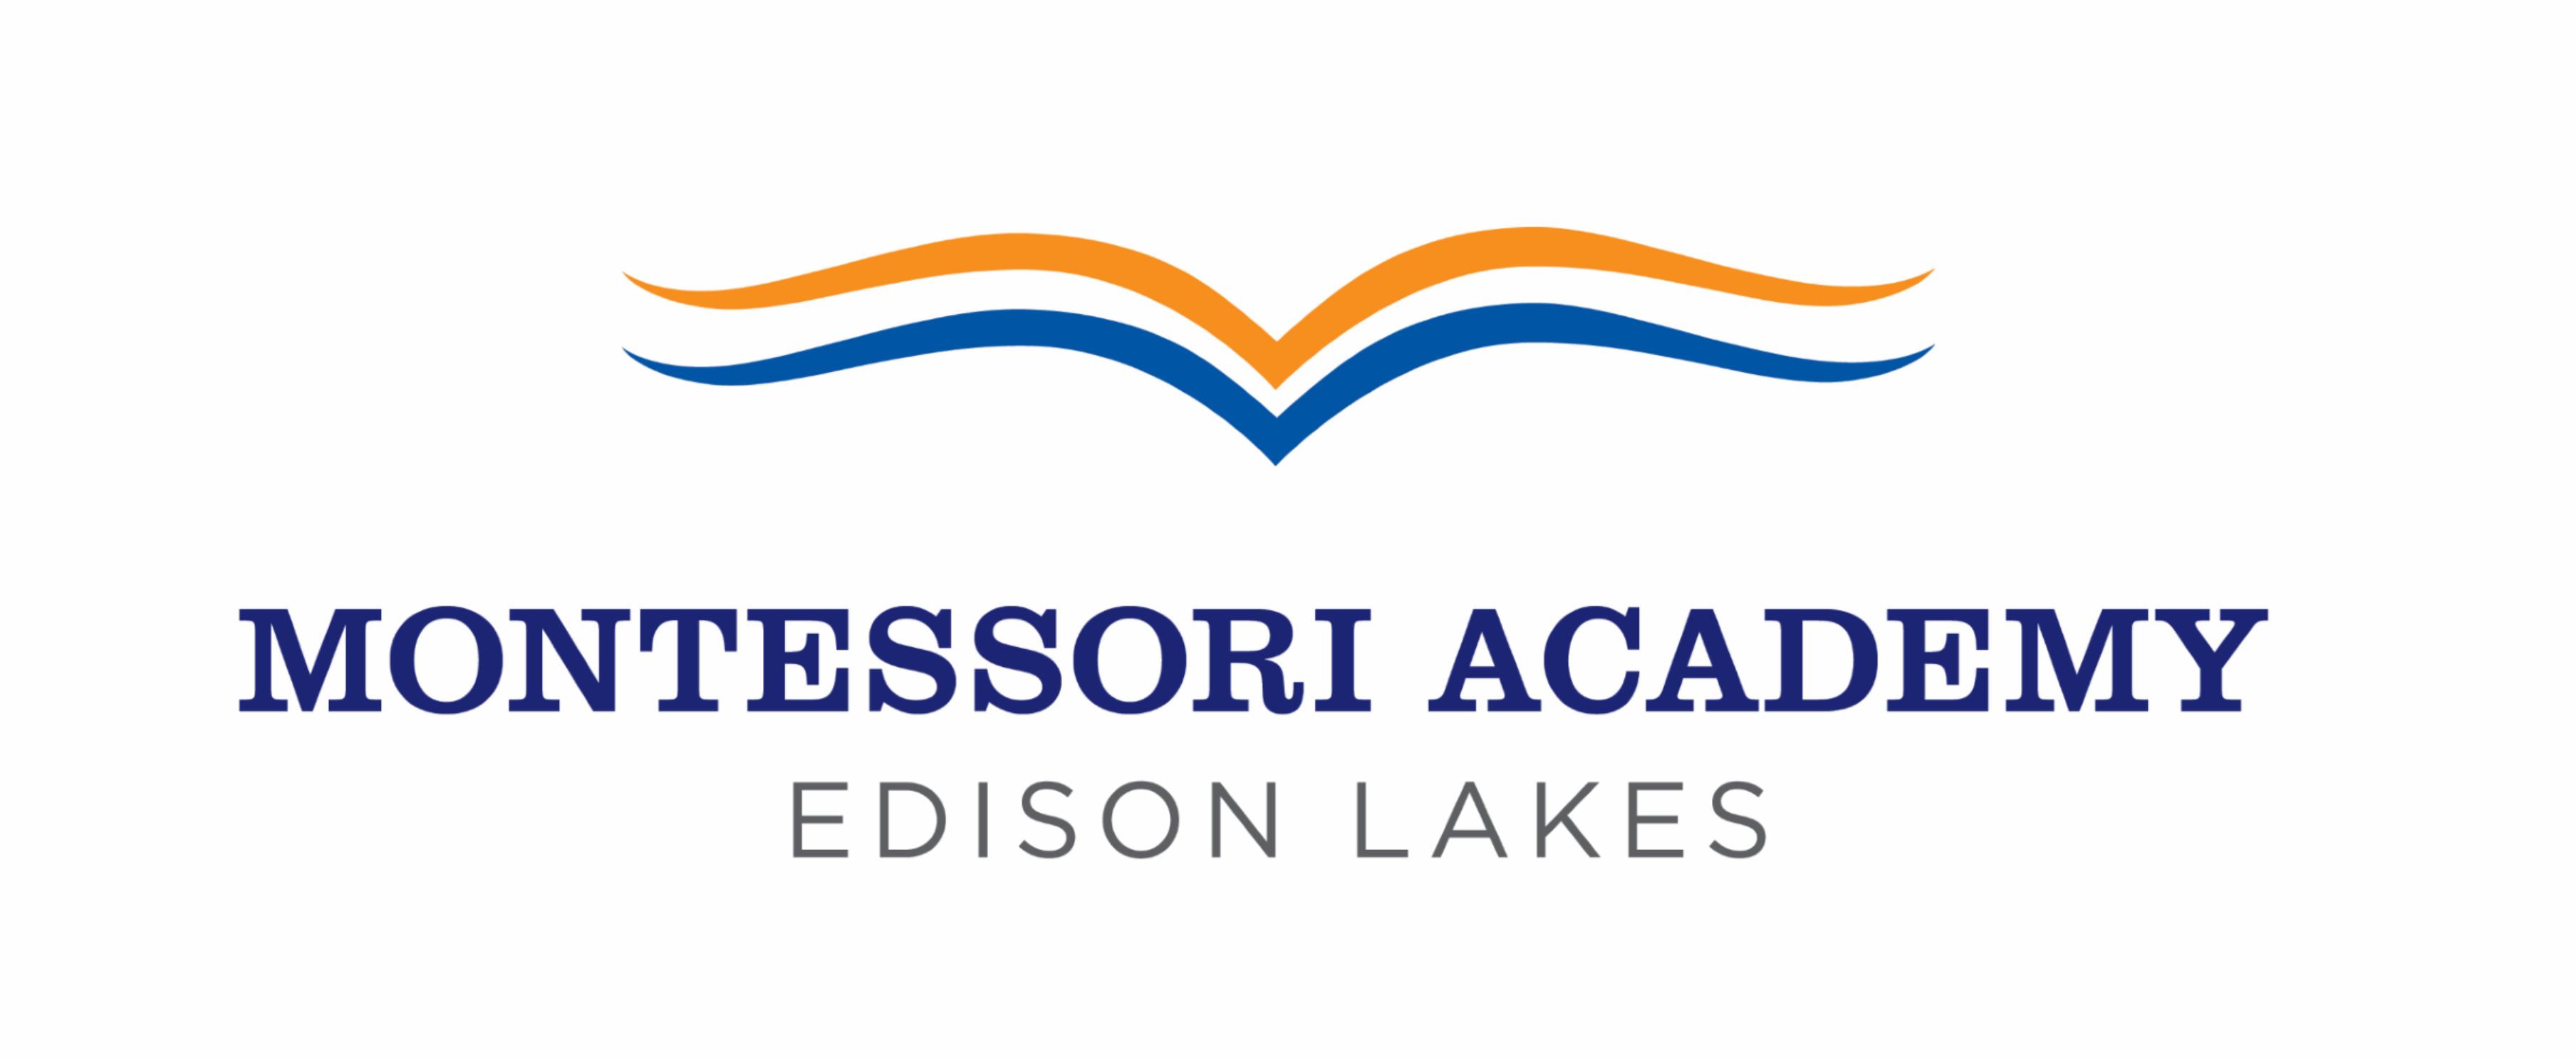 Nullen Client - Montessori Academy at Edison Lakes